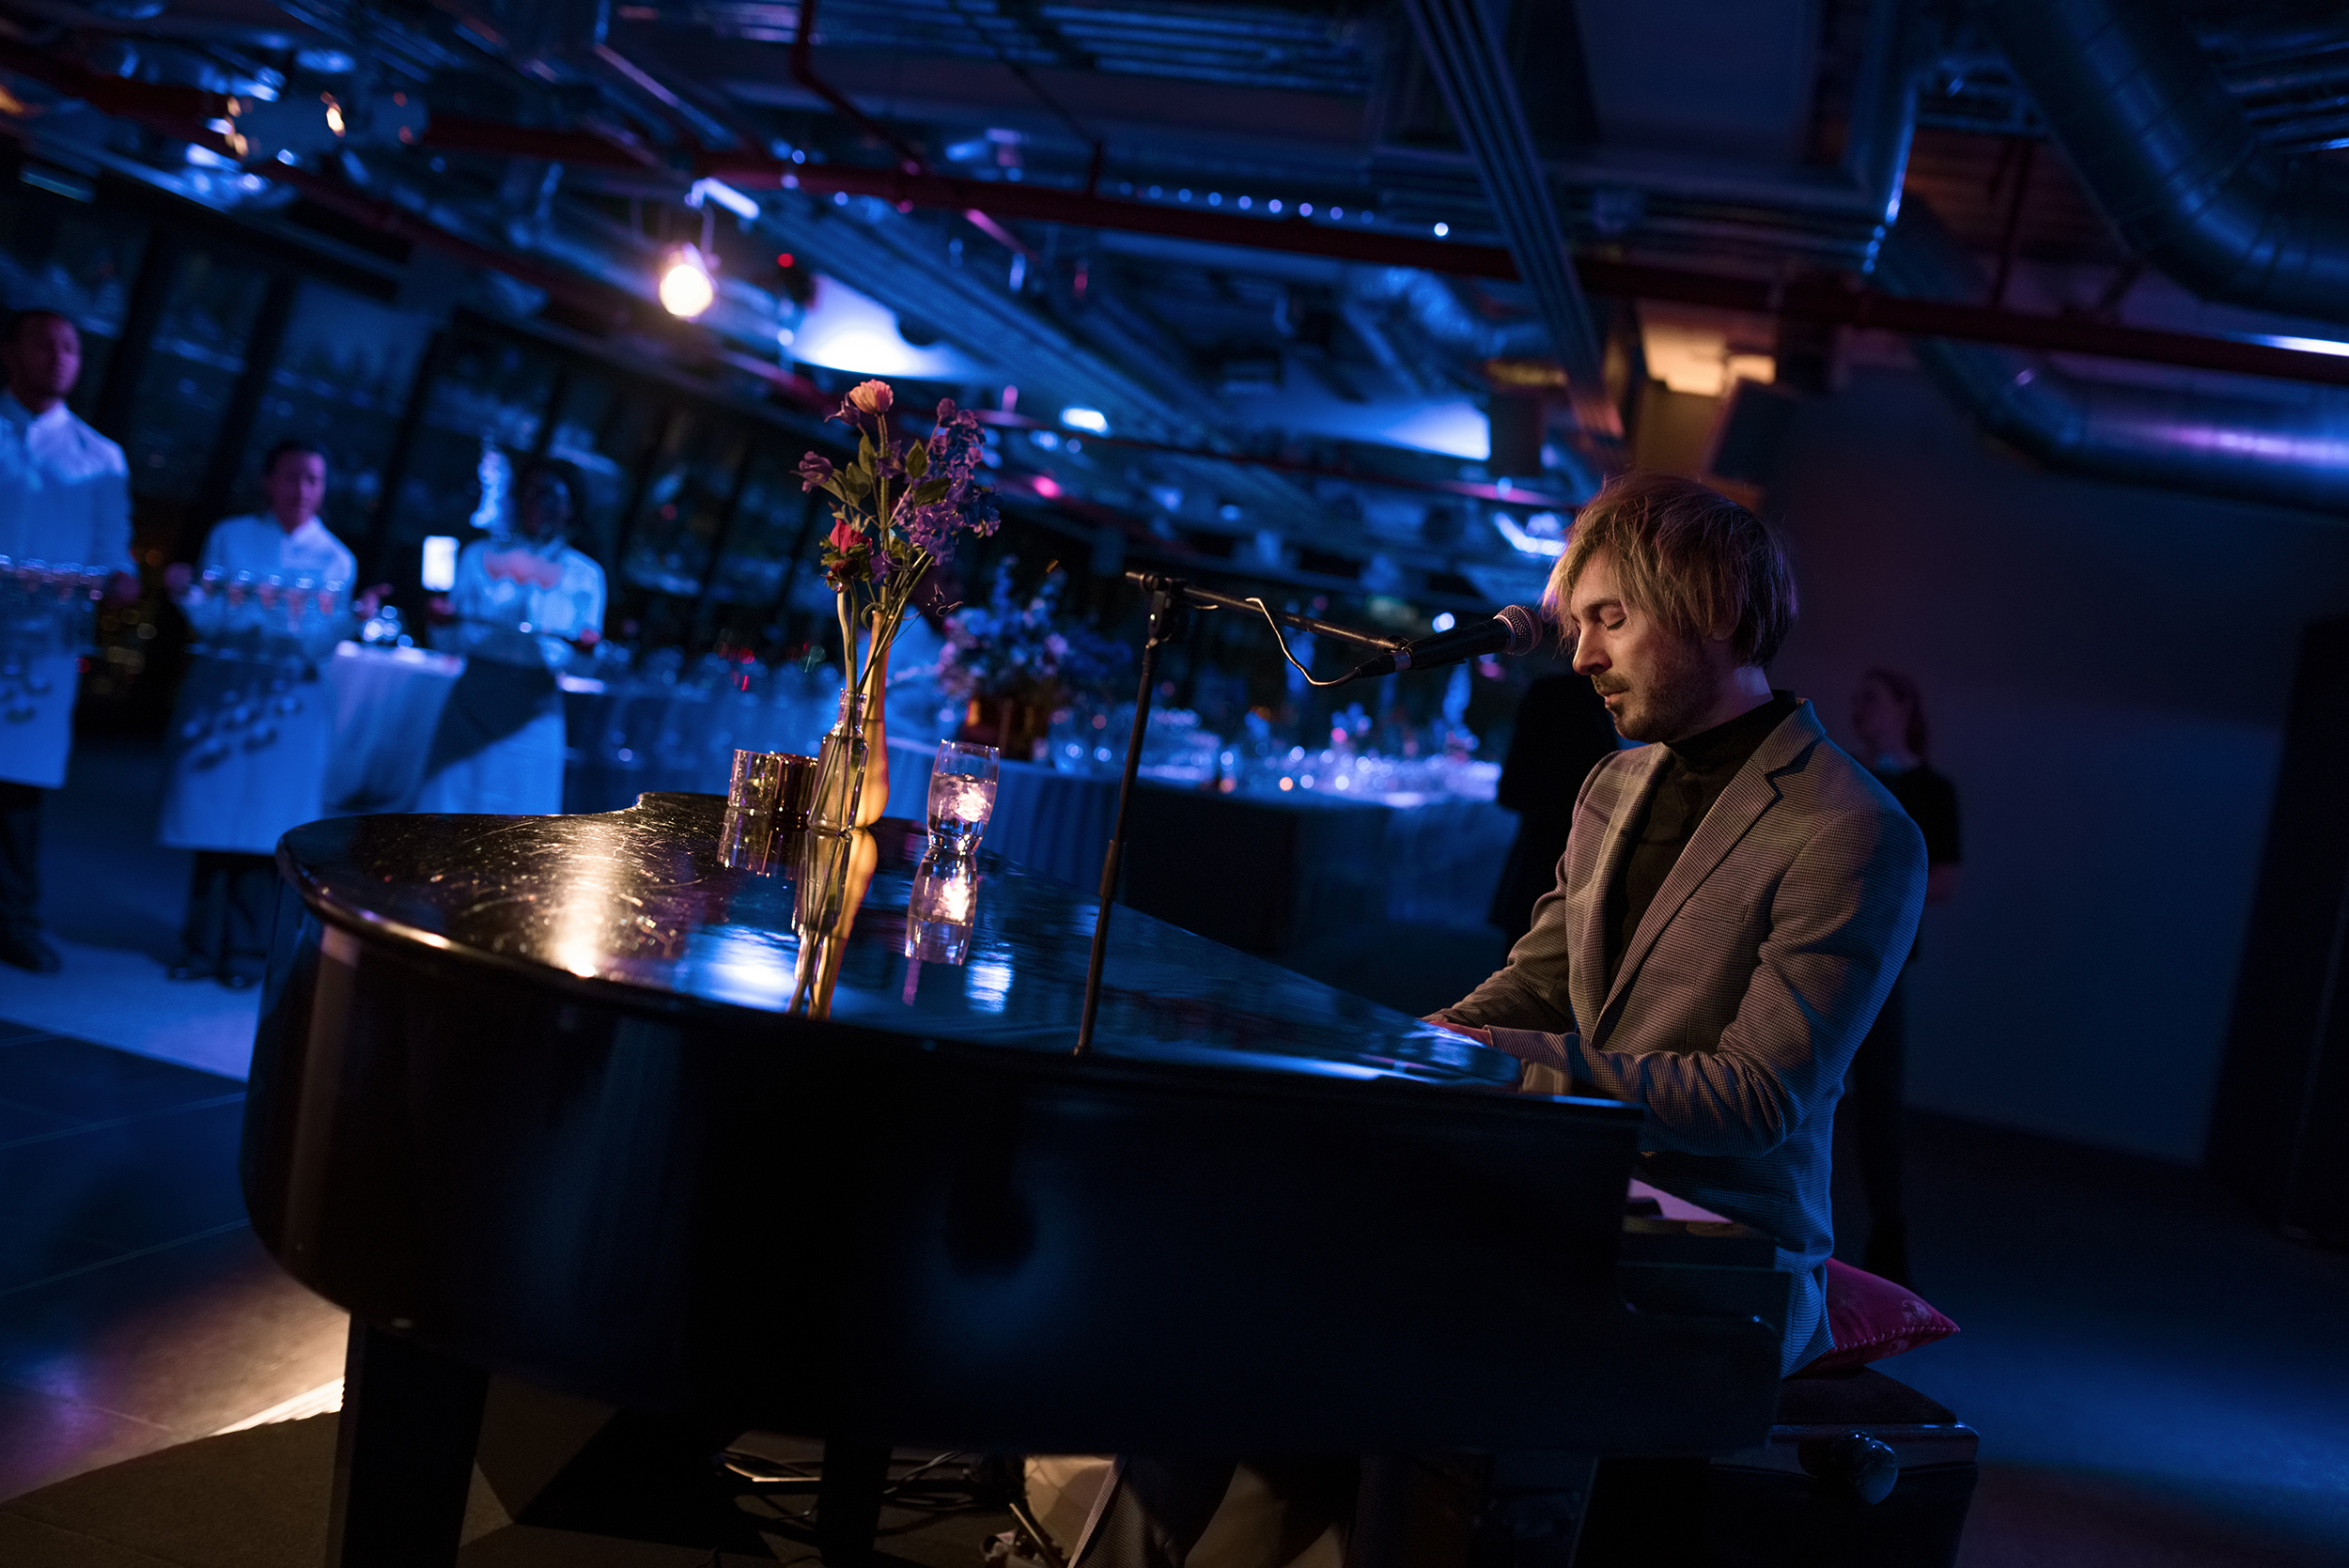 pianist1.jpg